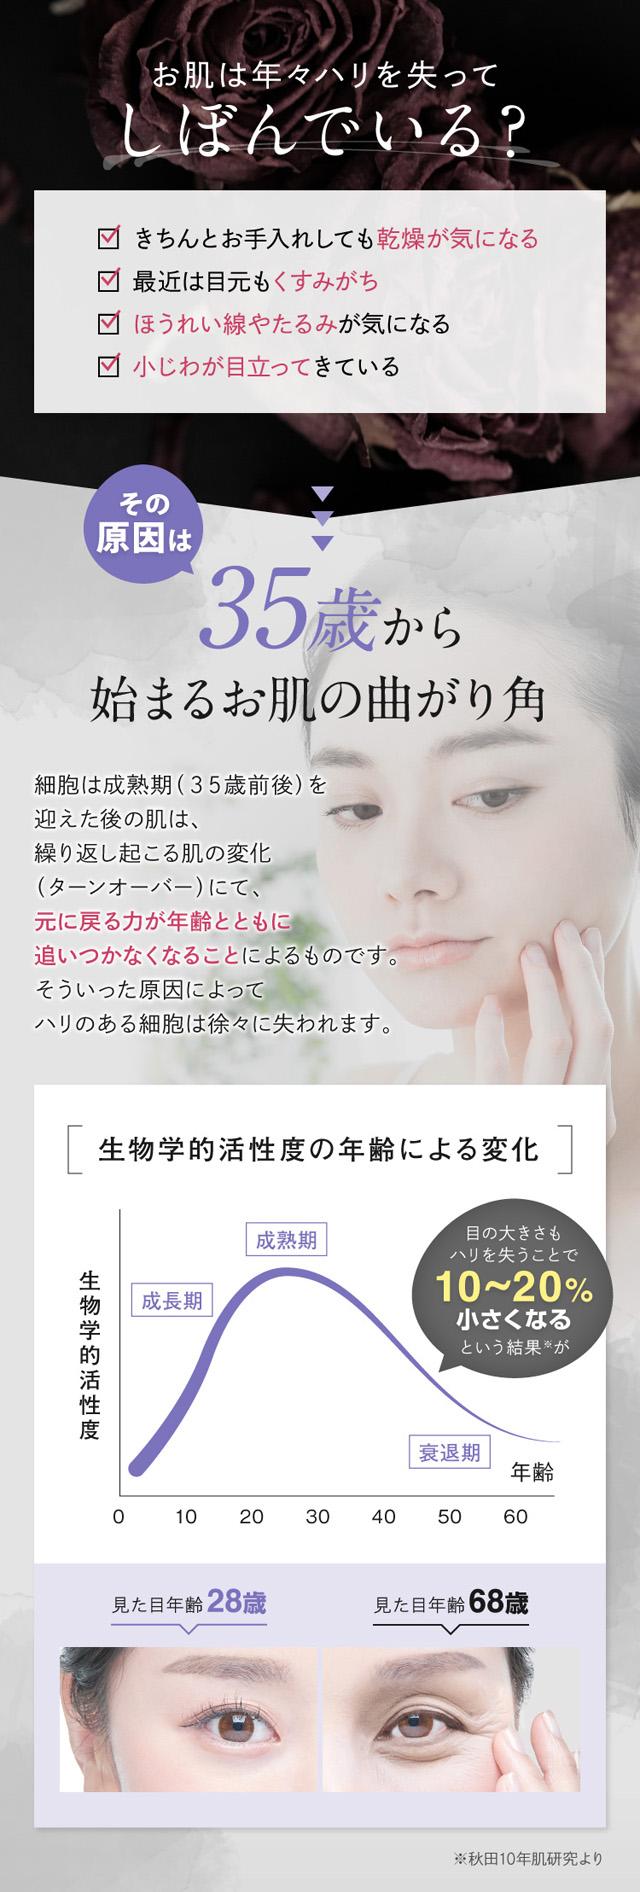 shimaboshi(シマボシ) モイスチャーローション,効果なし,評判,口コミ